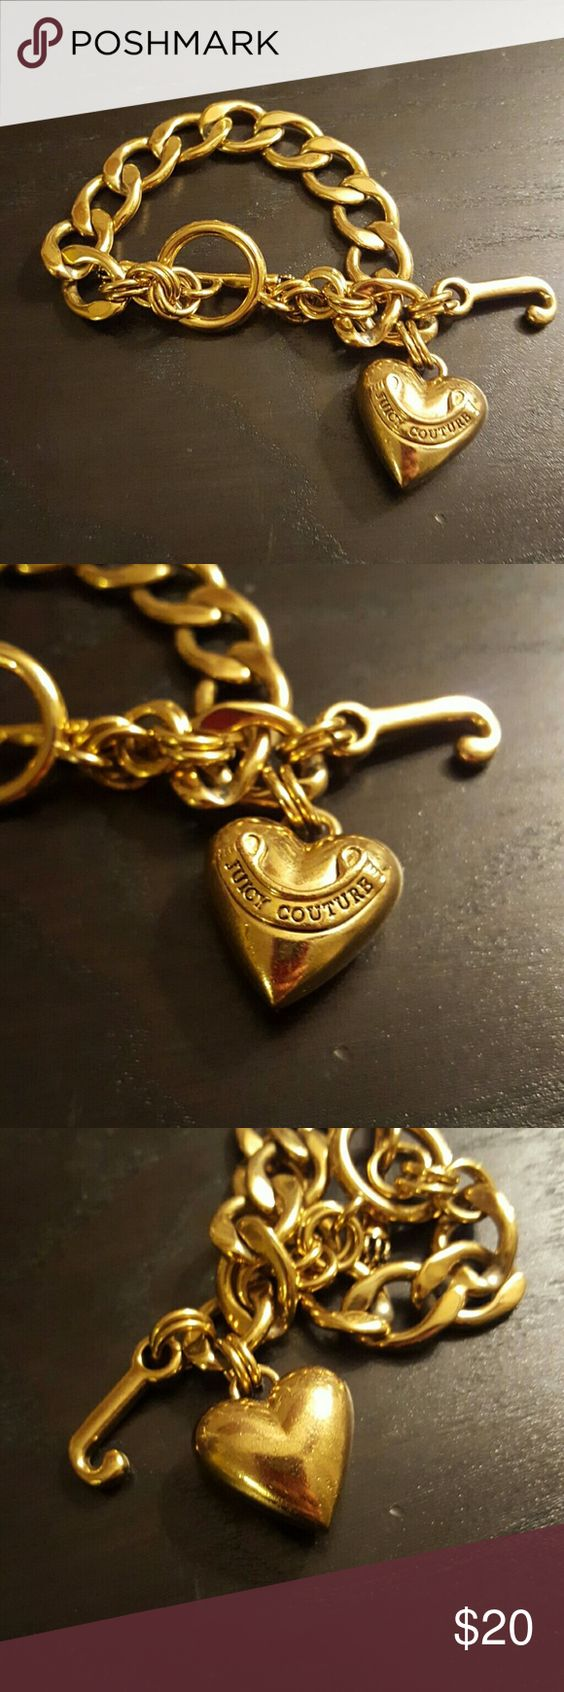 Juicy Couture Starter Charm Bracelet Some Wear, Not Much Gold Starter  Bracelet To Wear